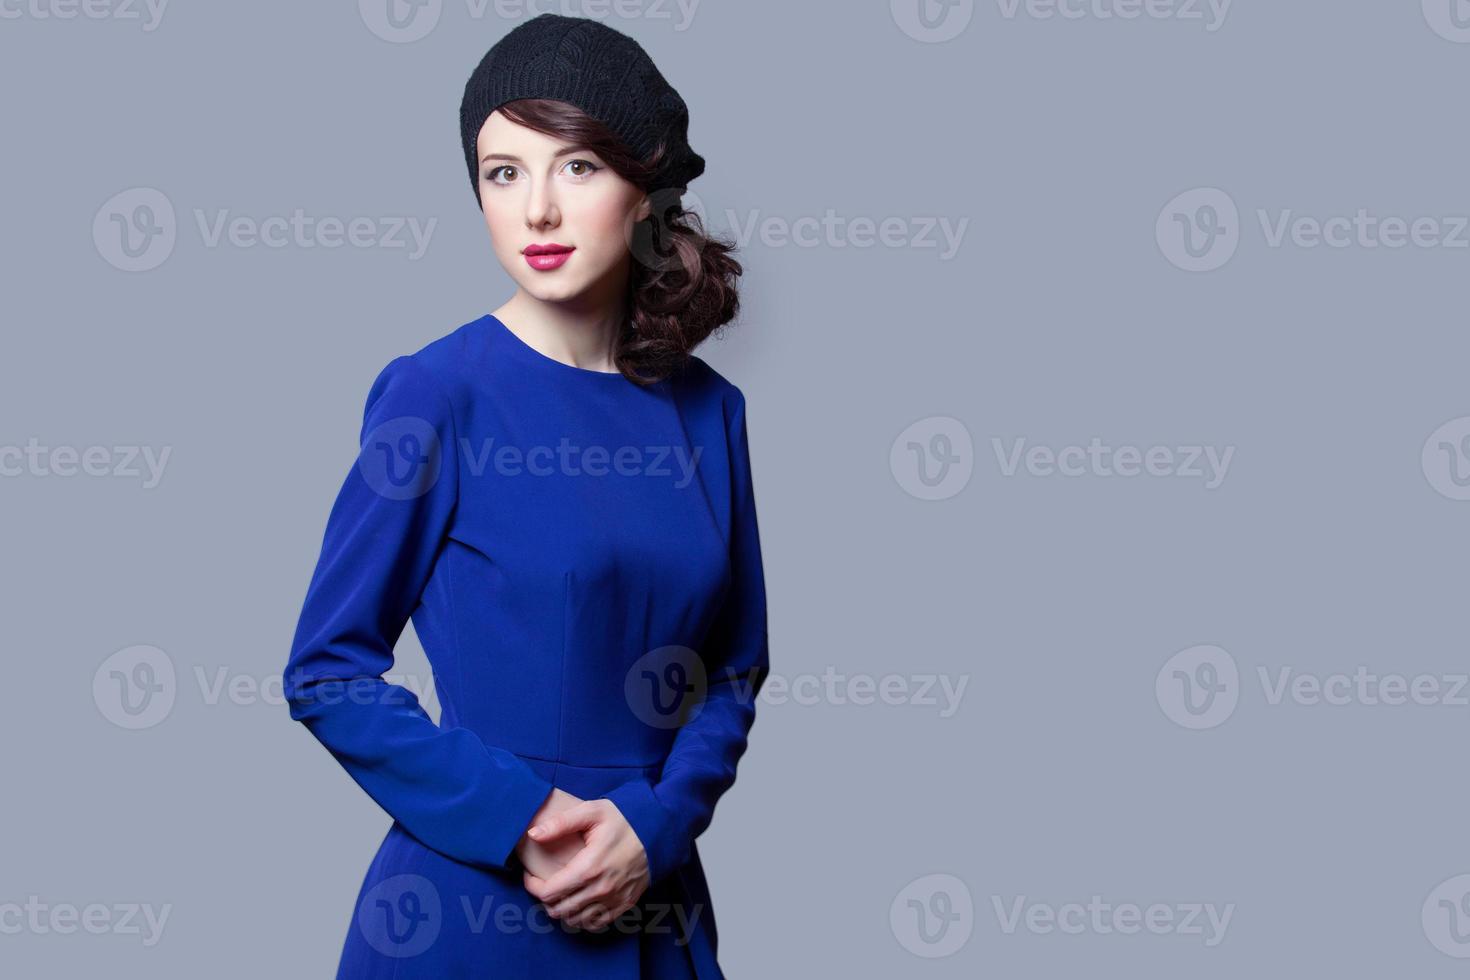 femmes en robe bleue photo